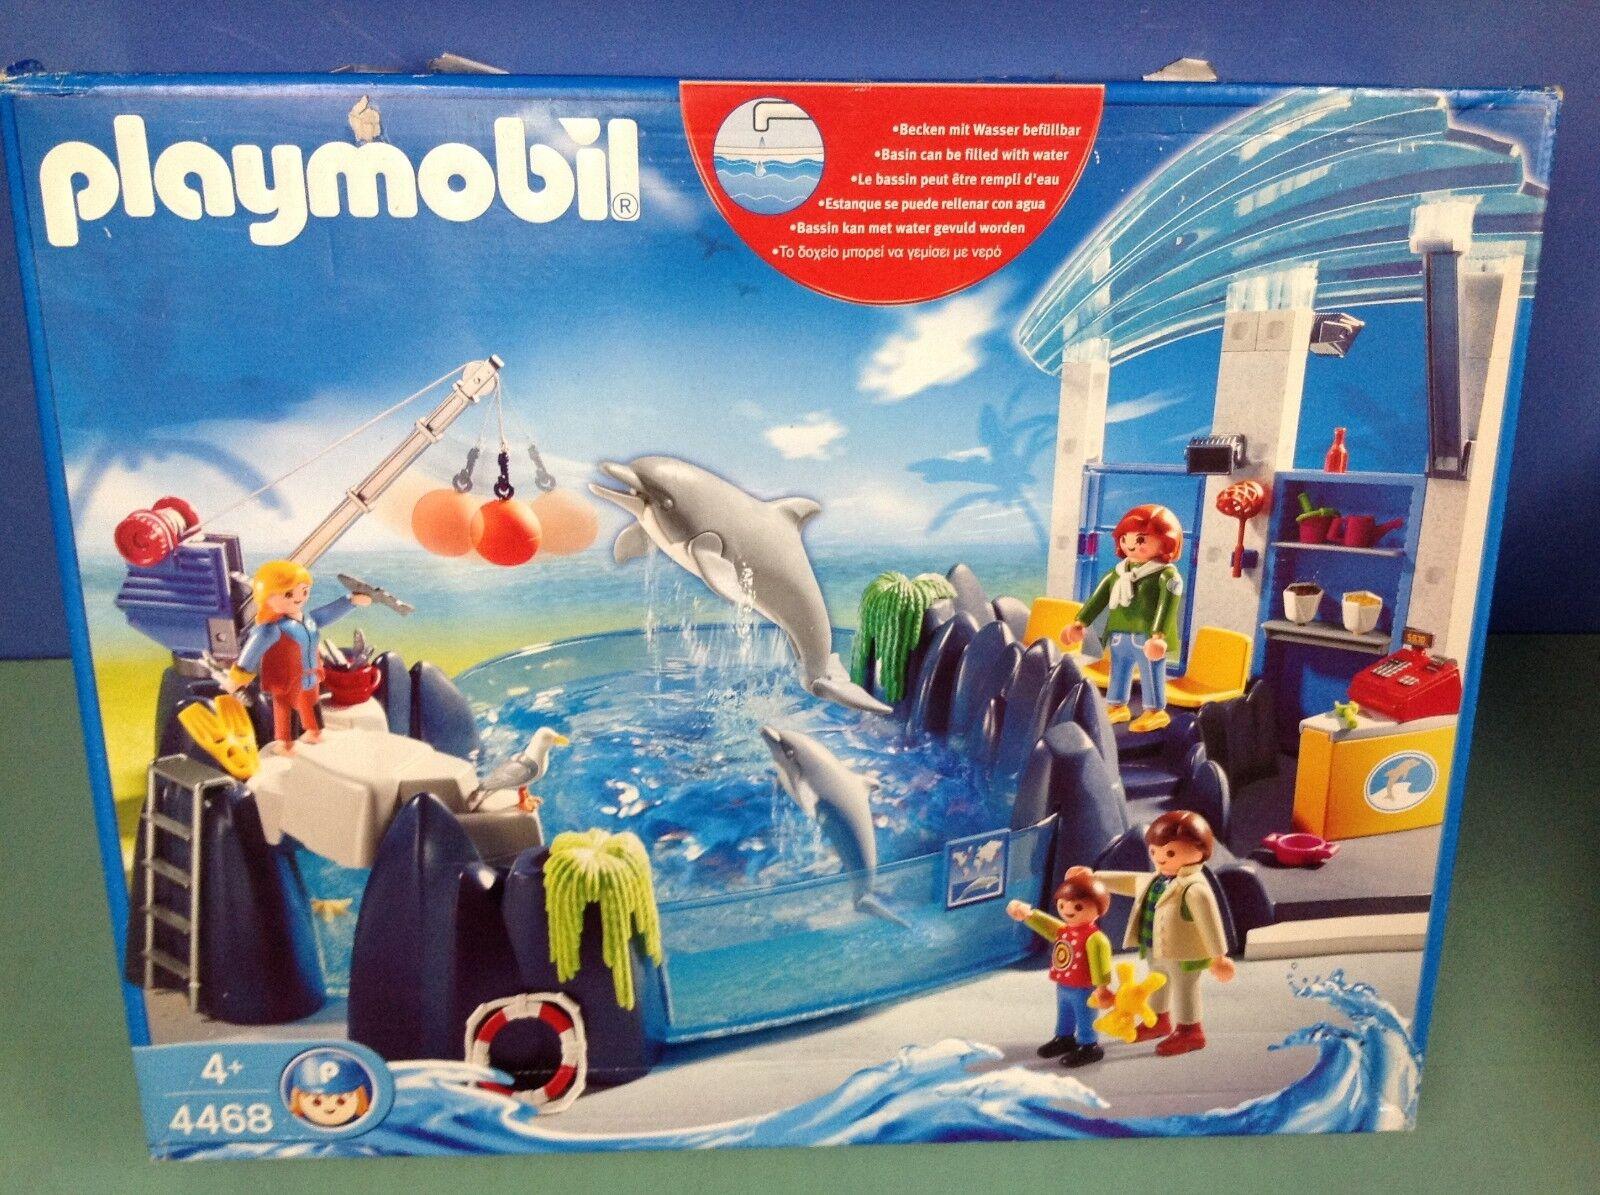 (P4468) playmobil Bassin des dauphins ref 4468 complet complet complet en boite zoo 3240 4462 ce1967